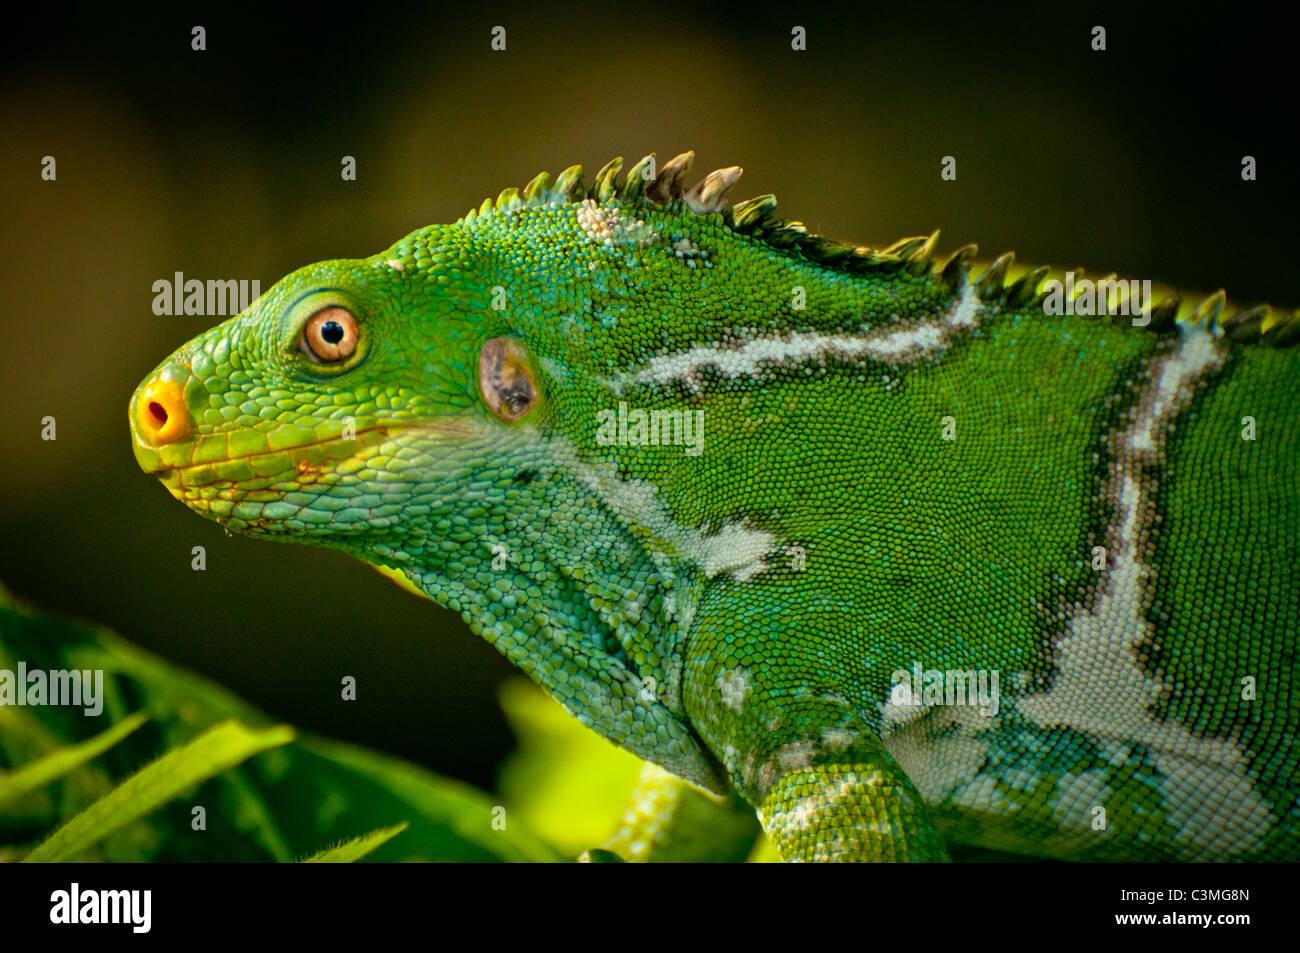 Crested Iguana, Kula Eco Park, Sigatoka Coral Coast,, Viti Levu, Fiji - Stock Image